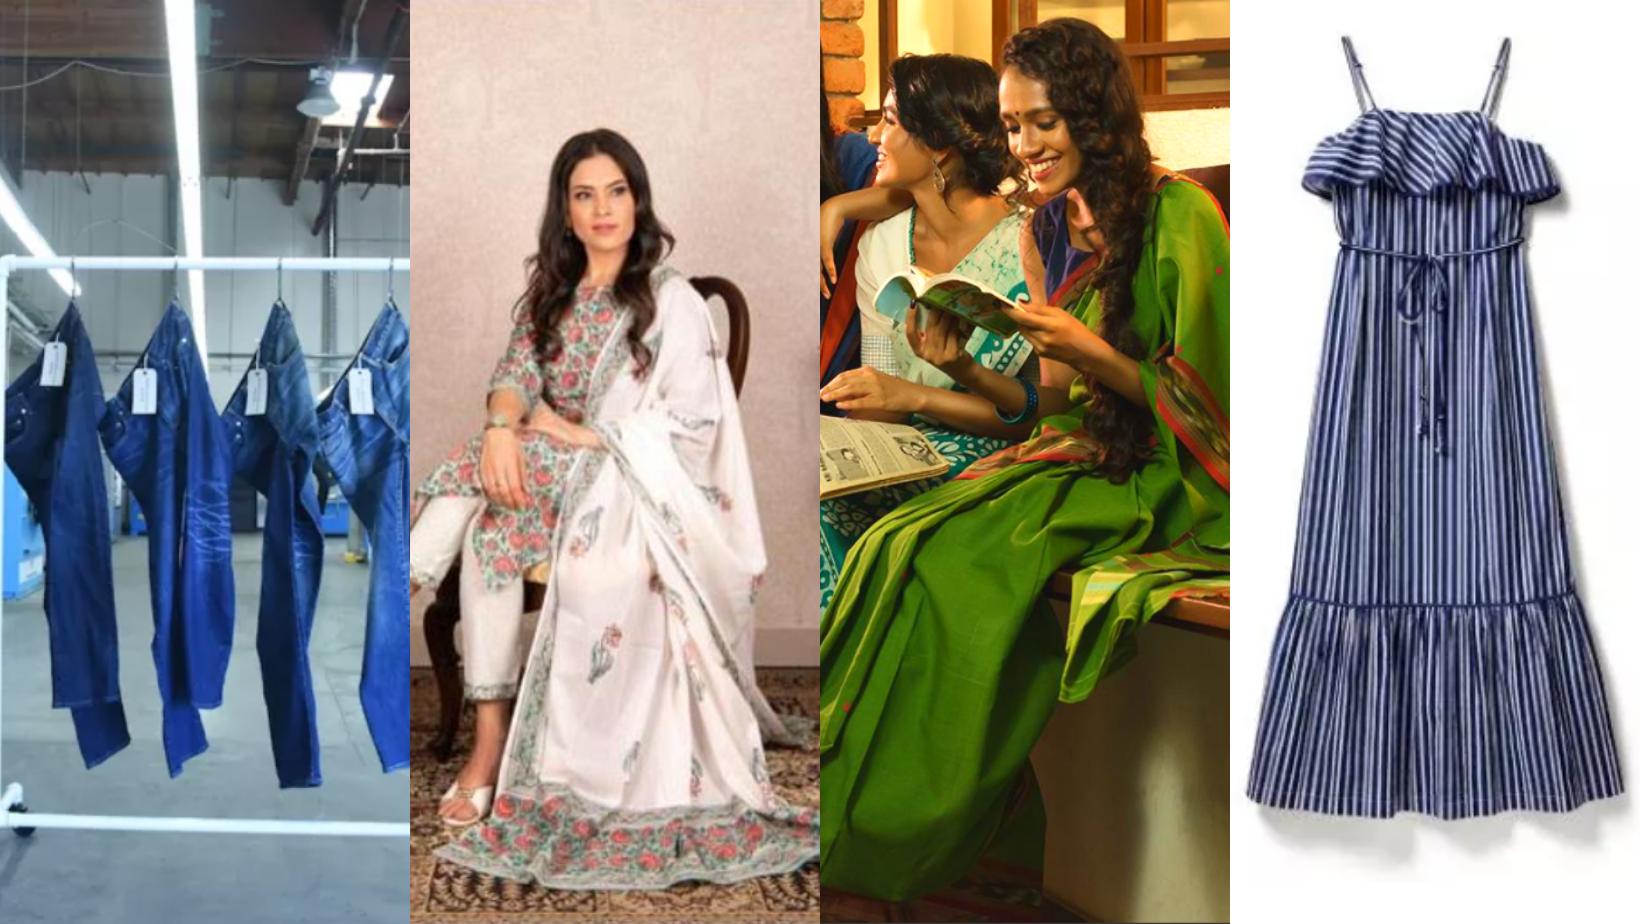 5 Eco-Friendly Fashion Brands – A Step Towards Conscious Fashion